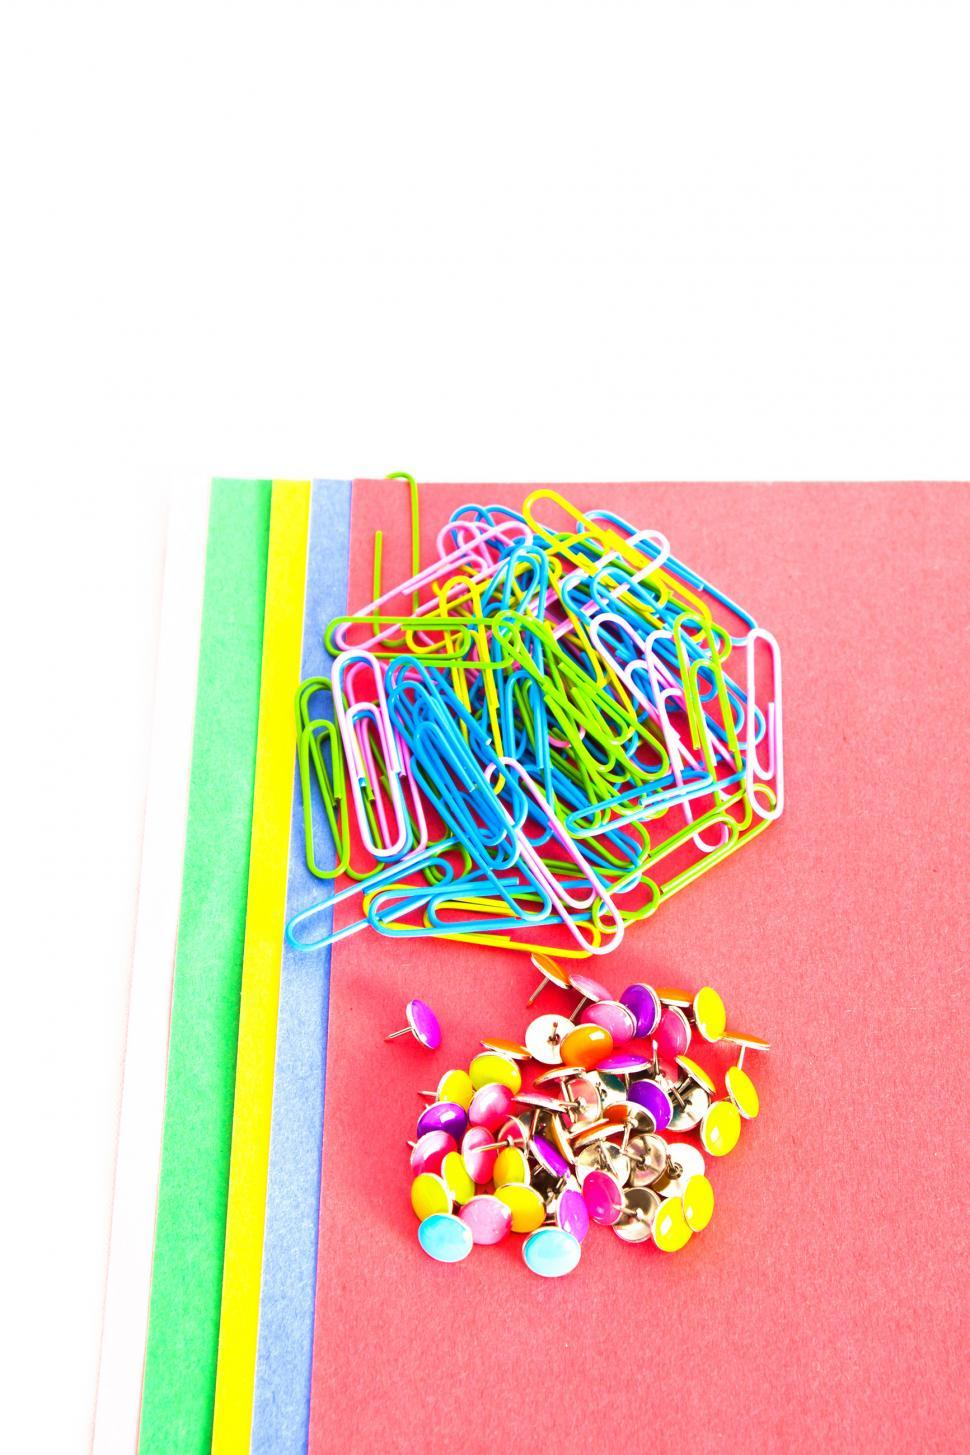 Download Free Stock Photo of School Supplies